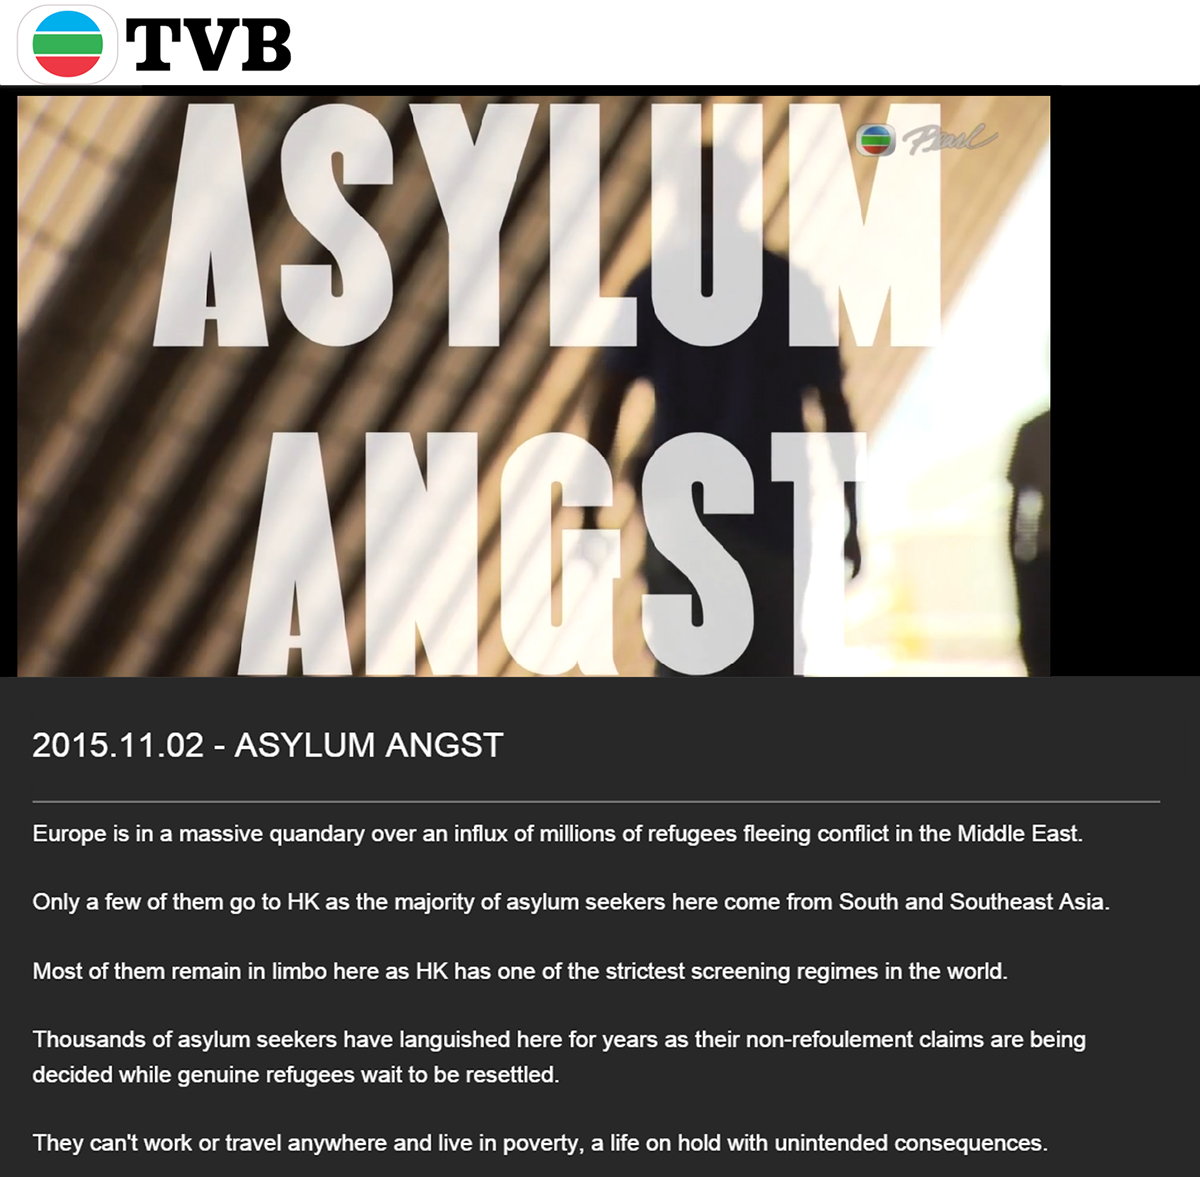 TVB - Pearl Report - Asylum Angst (2Nov2015)